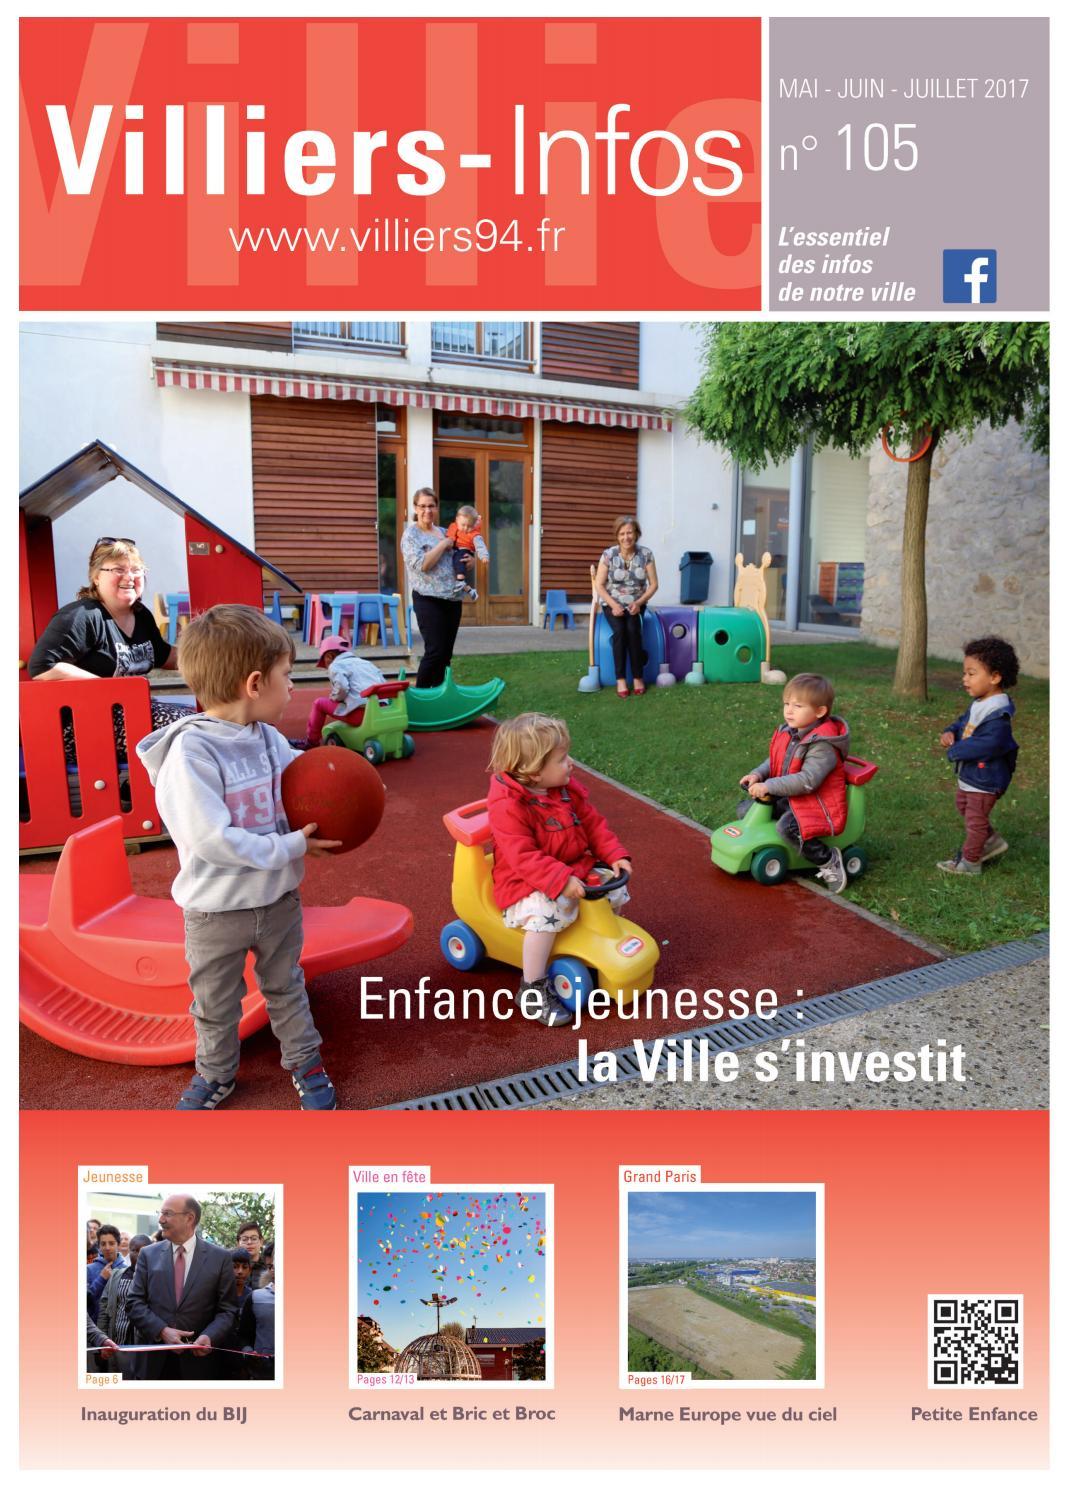 355127fe6d2fe Villiers-Infos n°105 by Mairie de Villiers-sur-Marne - issuu